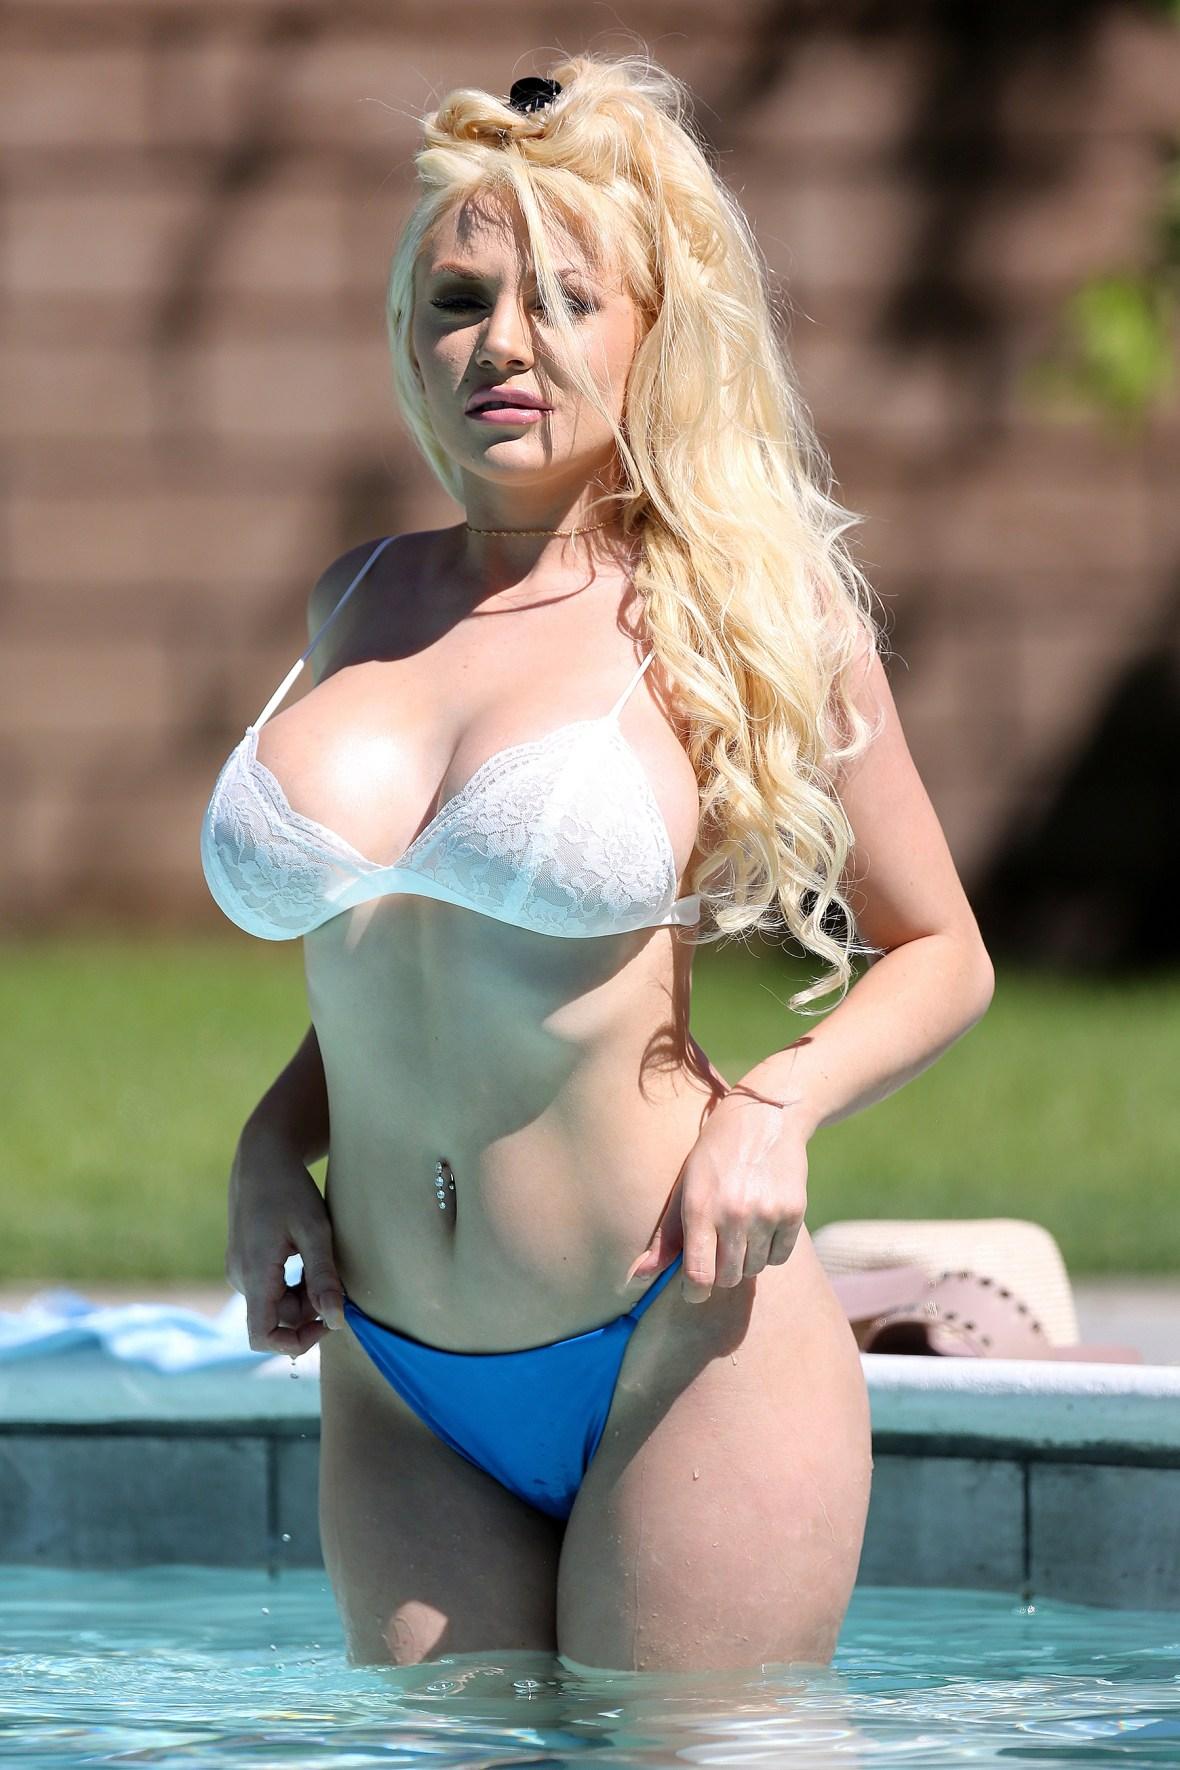 courtney stodden pool bikini palm springs figure actress flaunts divorce ok before